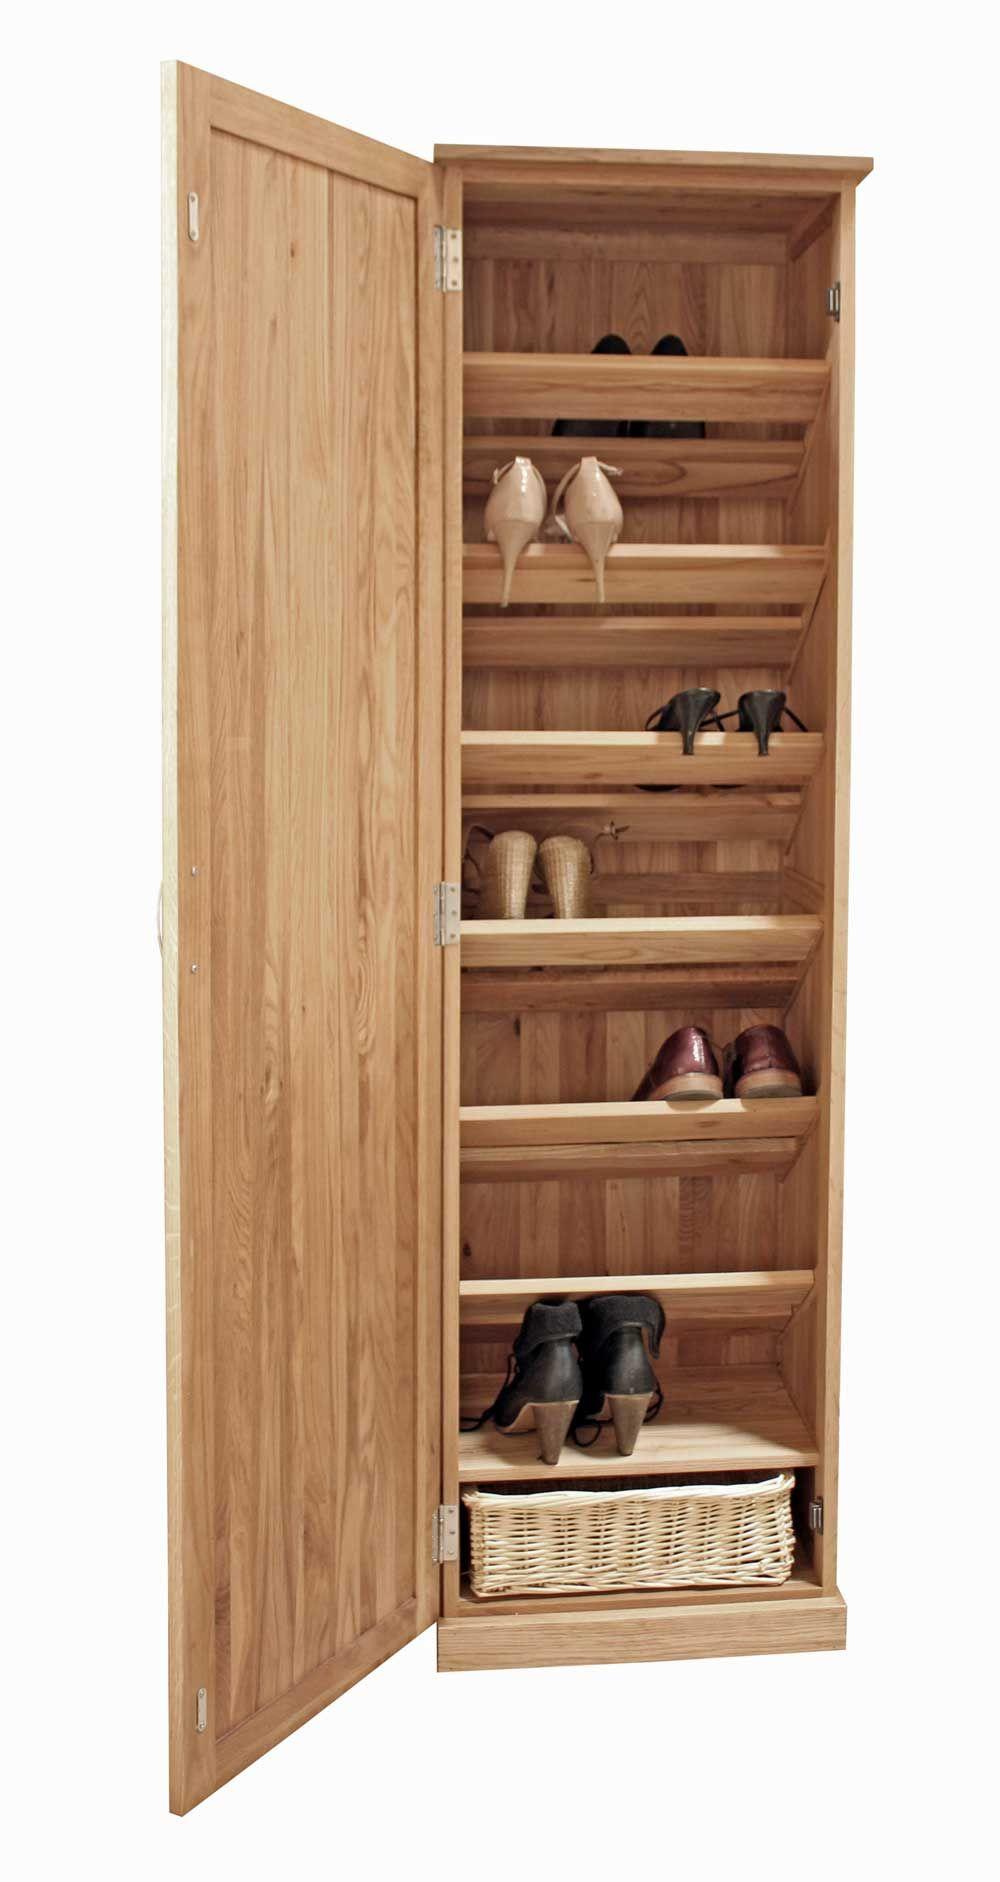 Classic Oak Tall Shoe Cupboard Hampshire Furniture Zapateras Modernas Diseno De Closet Muebles Para Zapatos